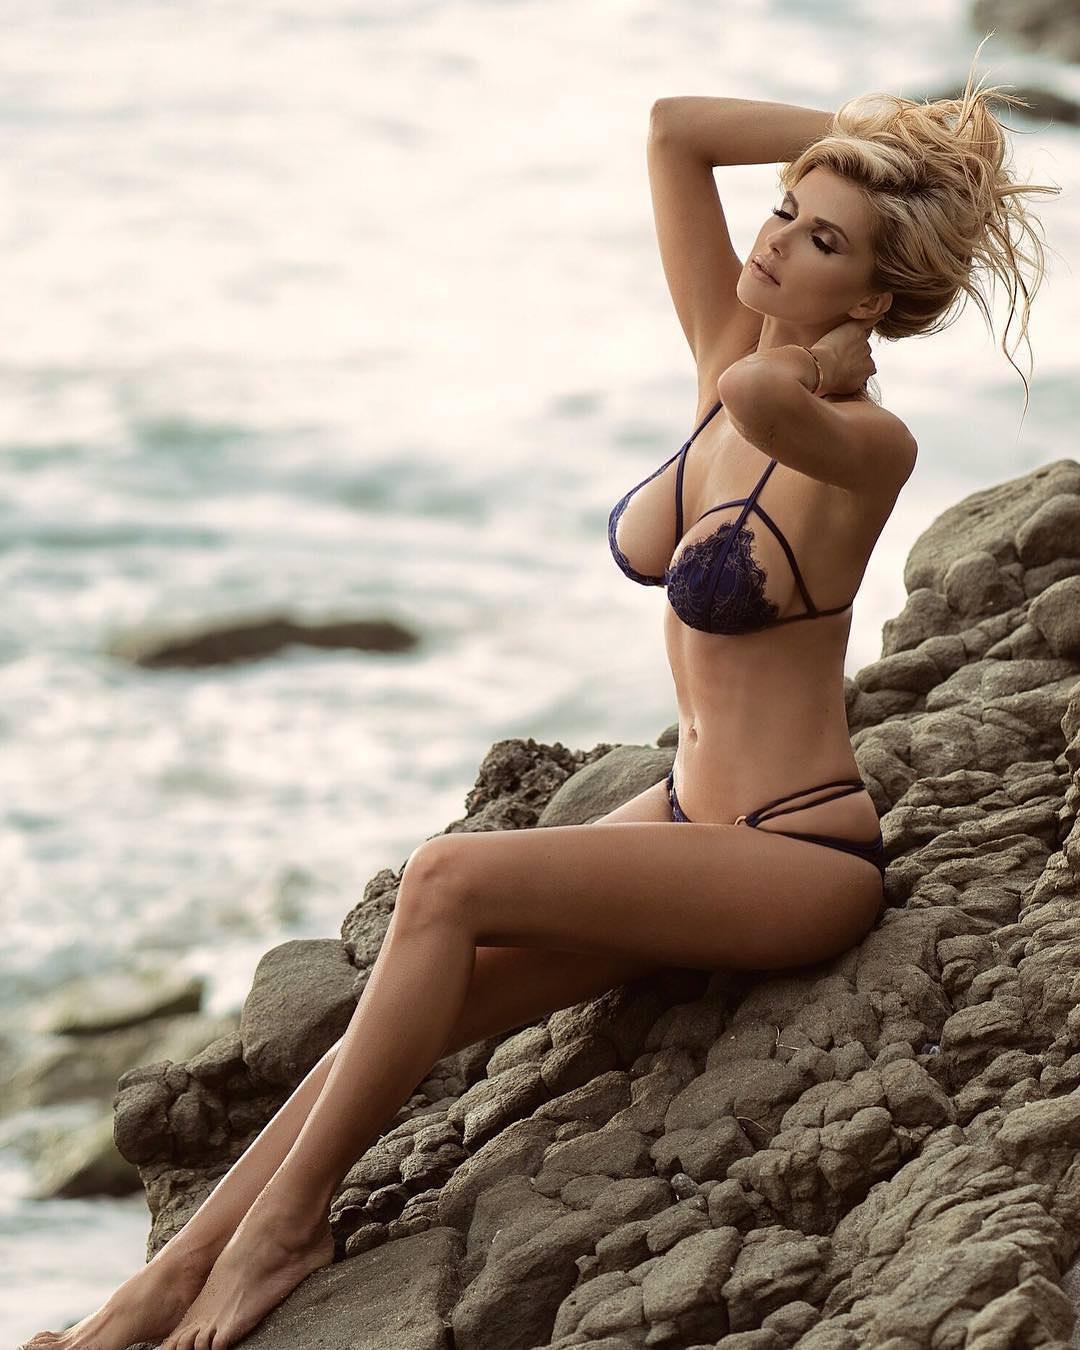 Leanna Bartlett en bikini